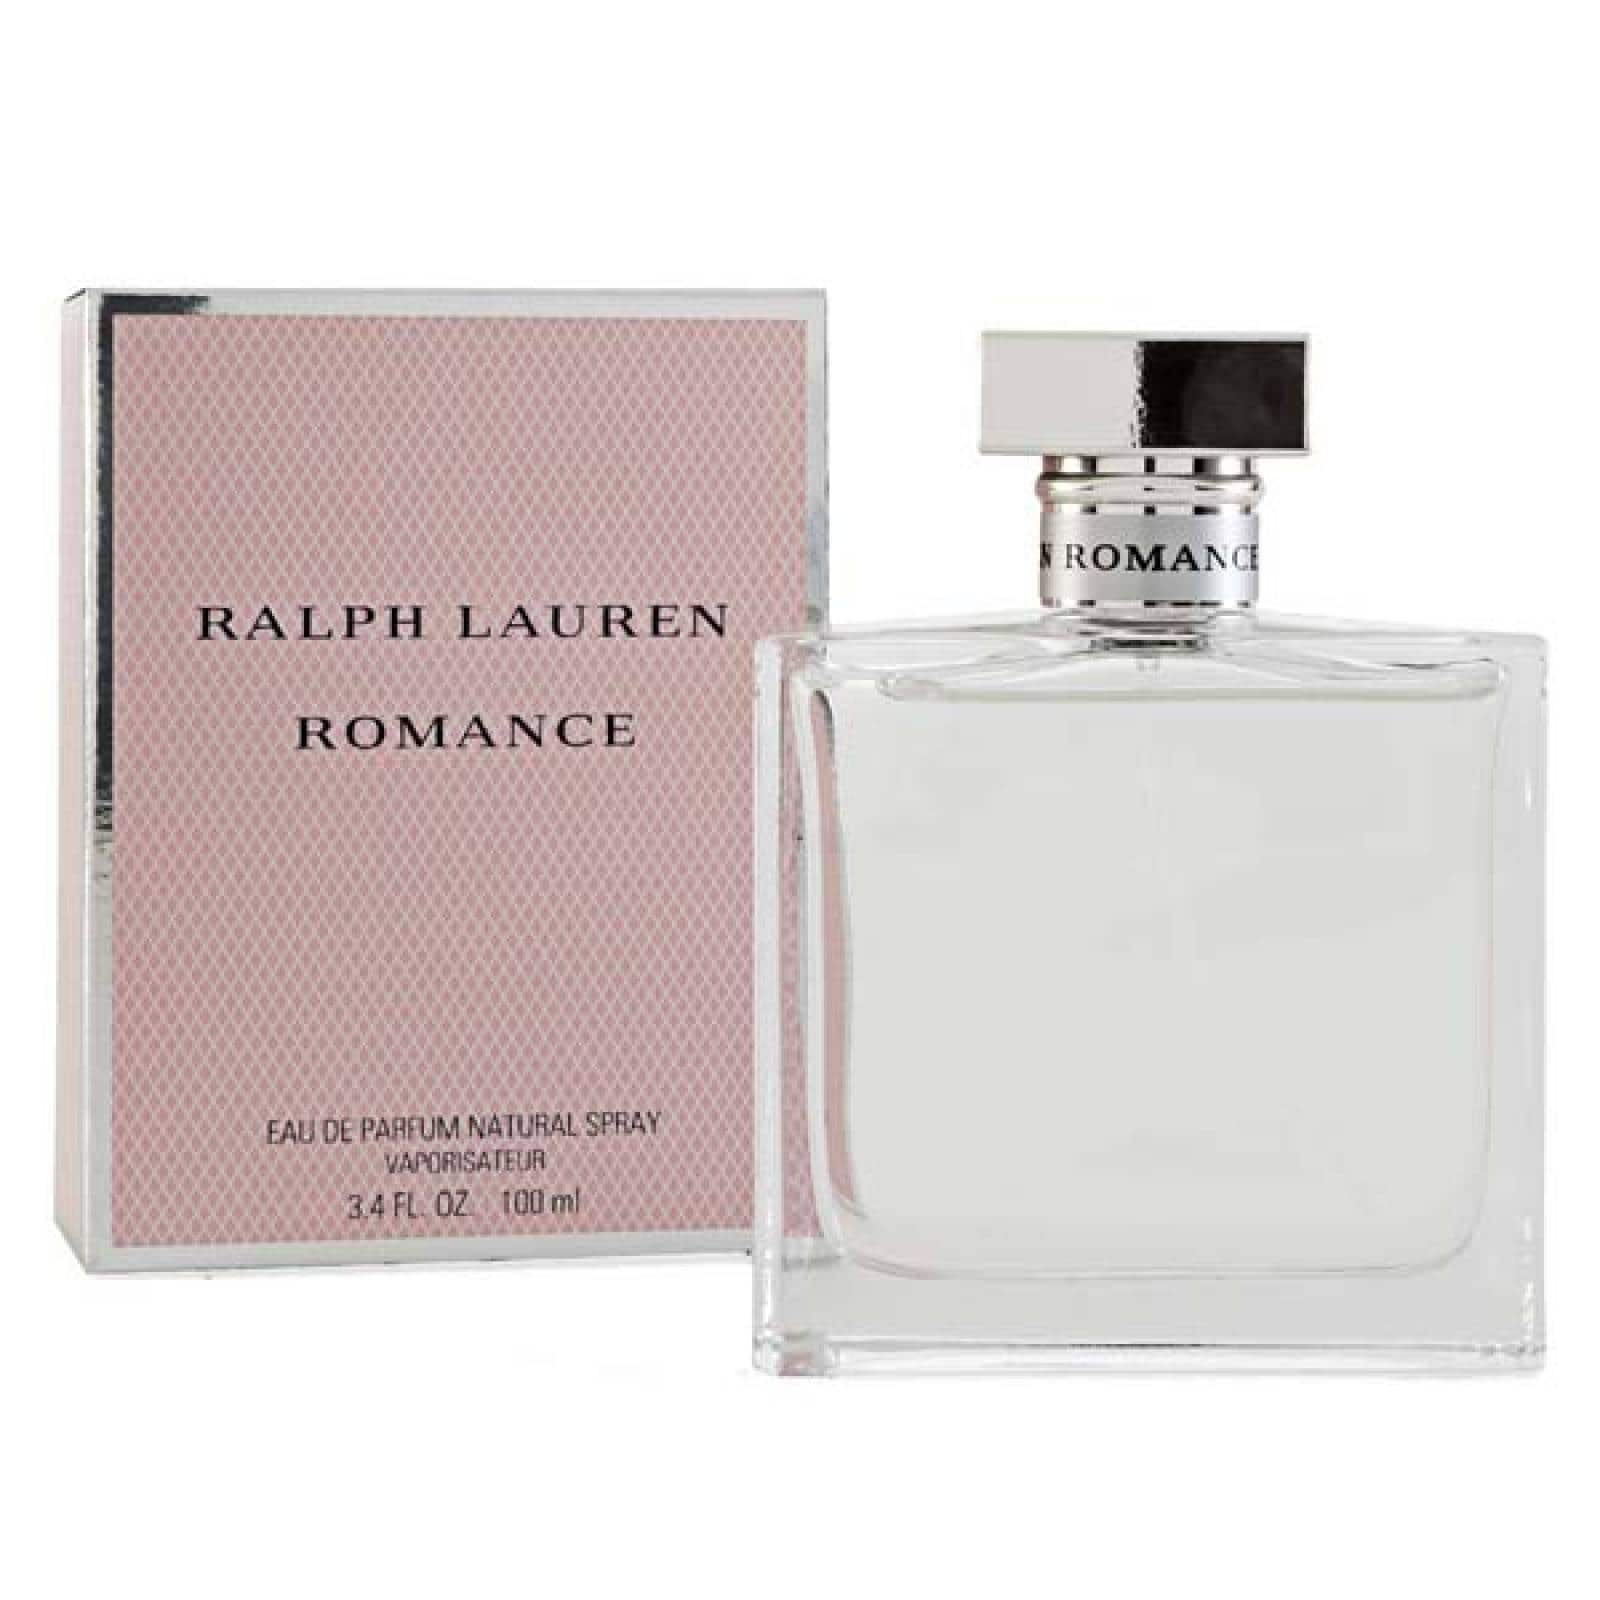 RALPH LAUREN ROMANCE 100 ML DAMA